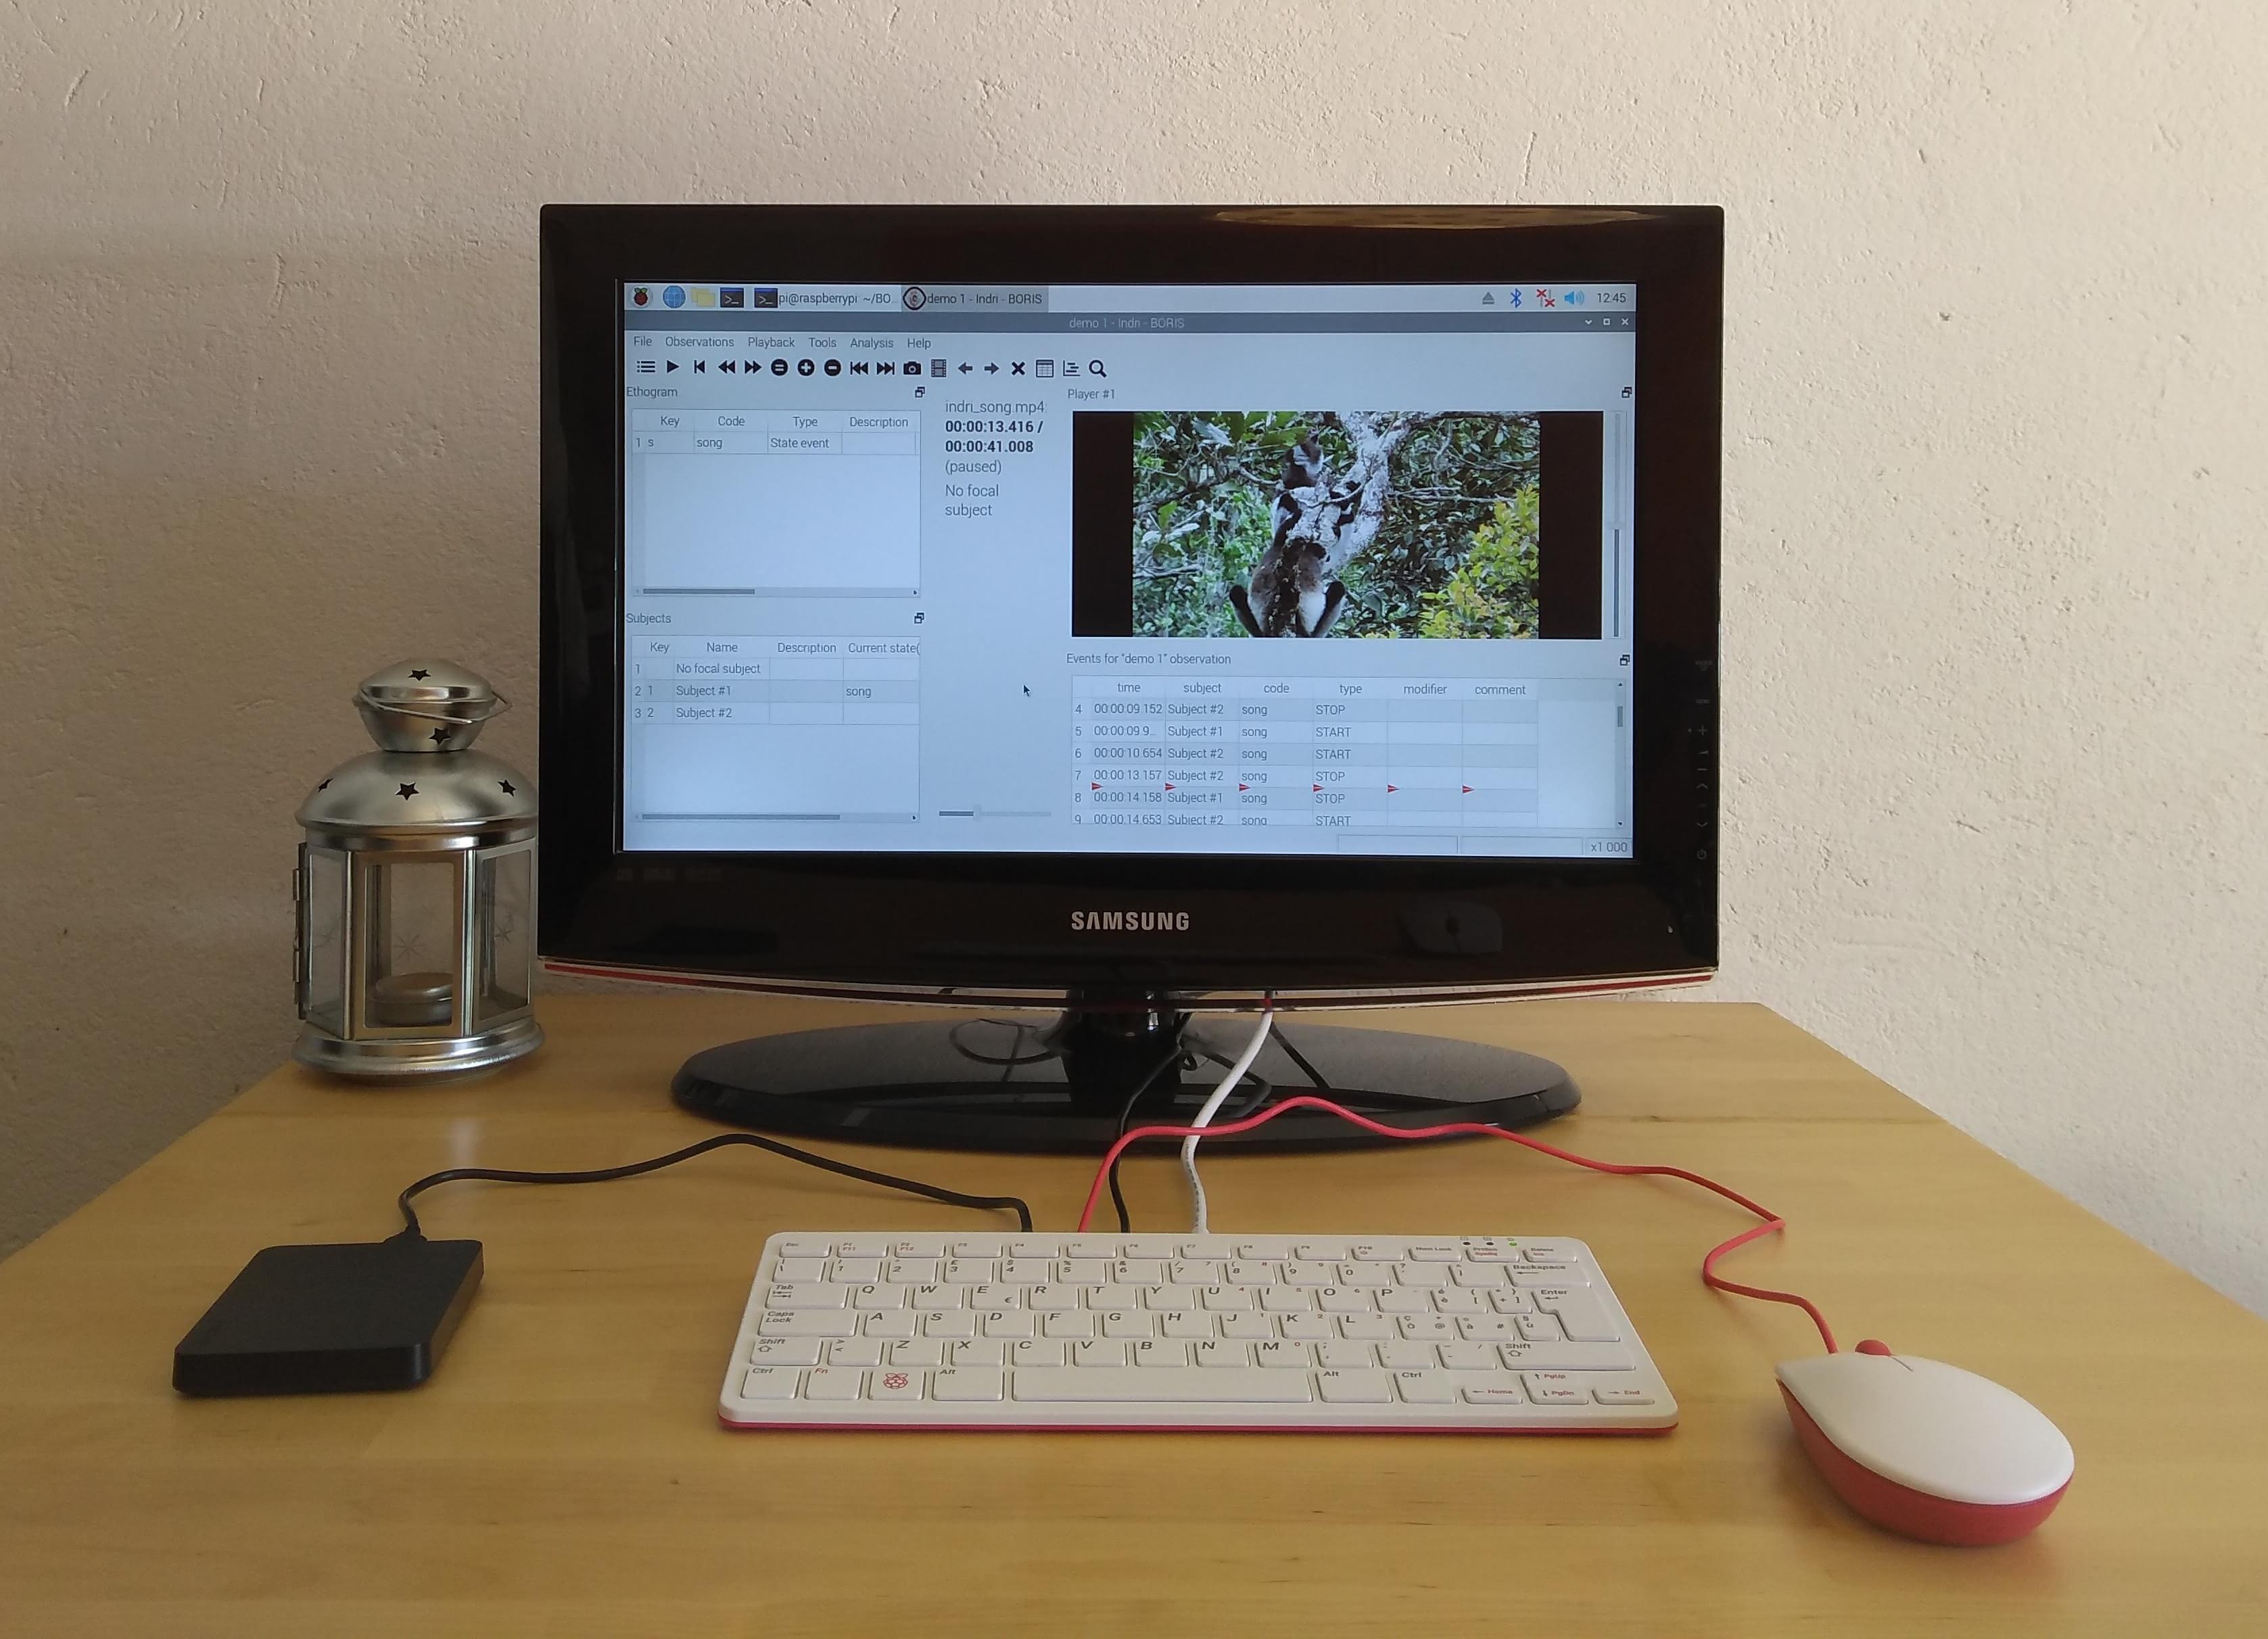 BORIS running on a Raspberry 400 Pi